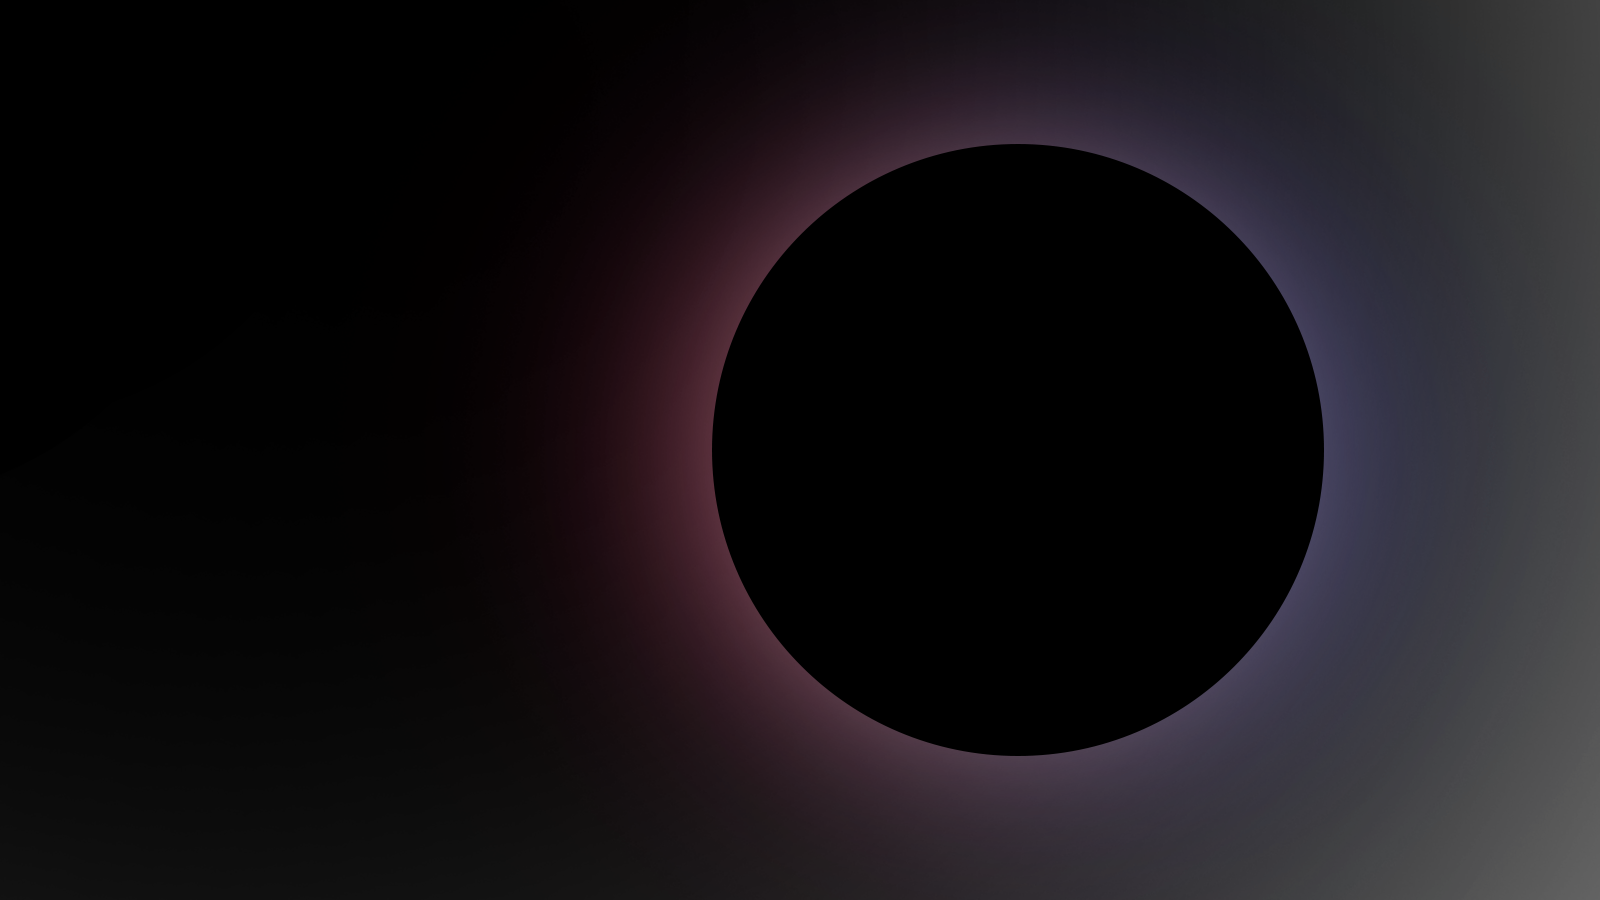 dark matter black holes - photo #9